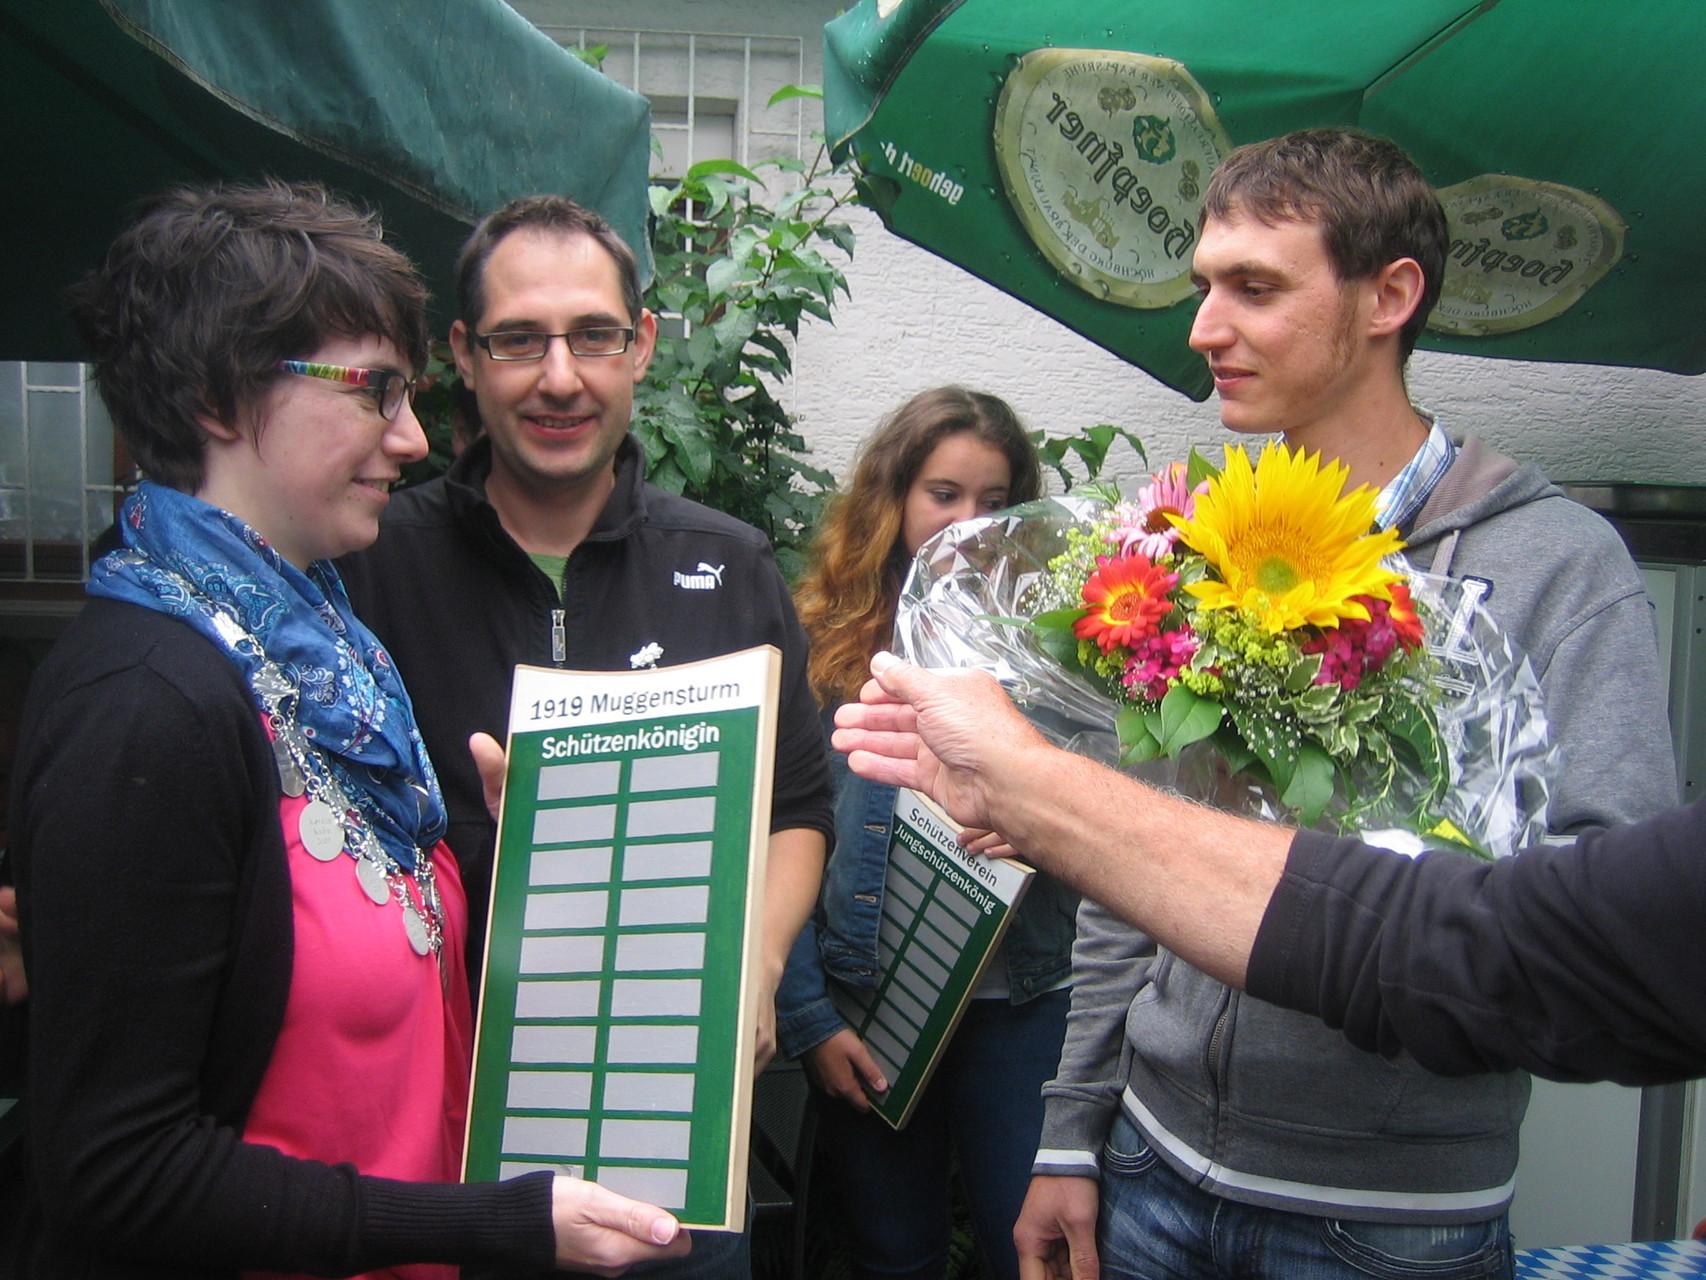 Proklamation der Königsfamilie: Schützenkönigin Kerstin Huber